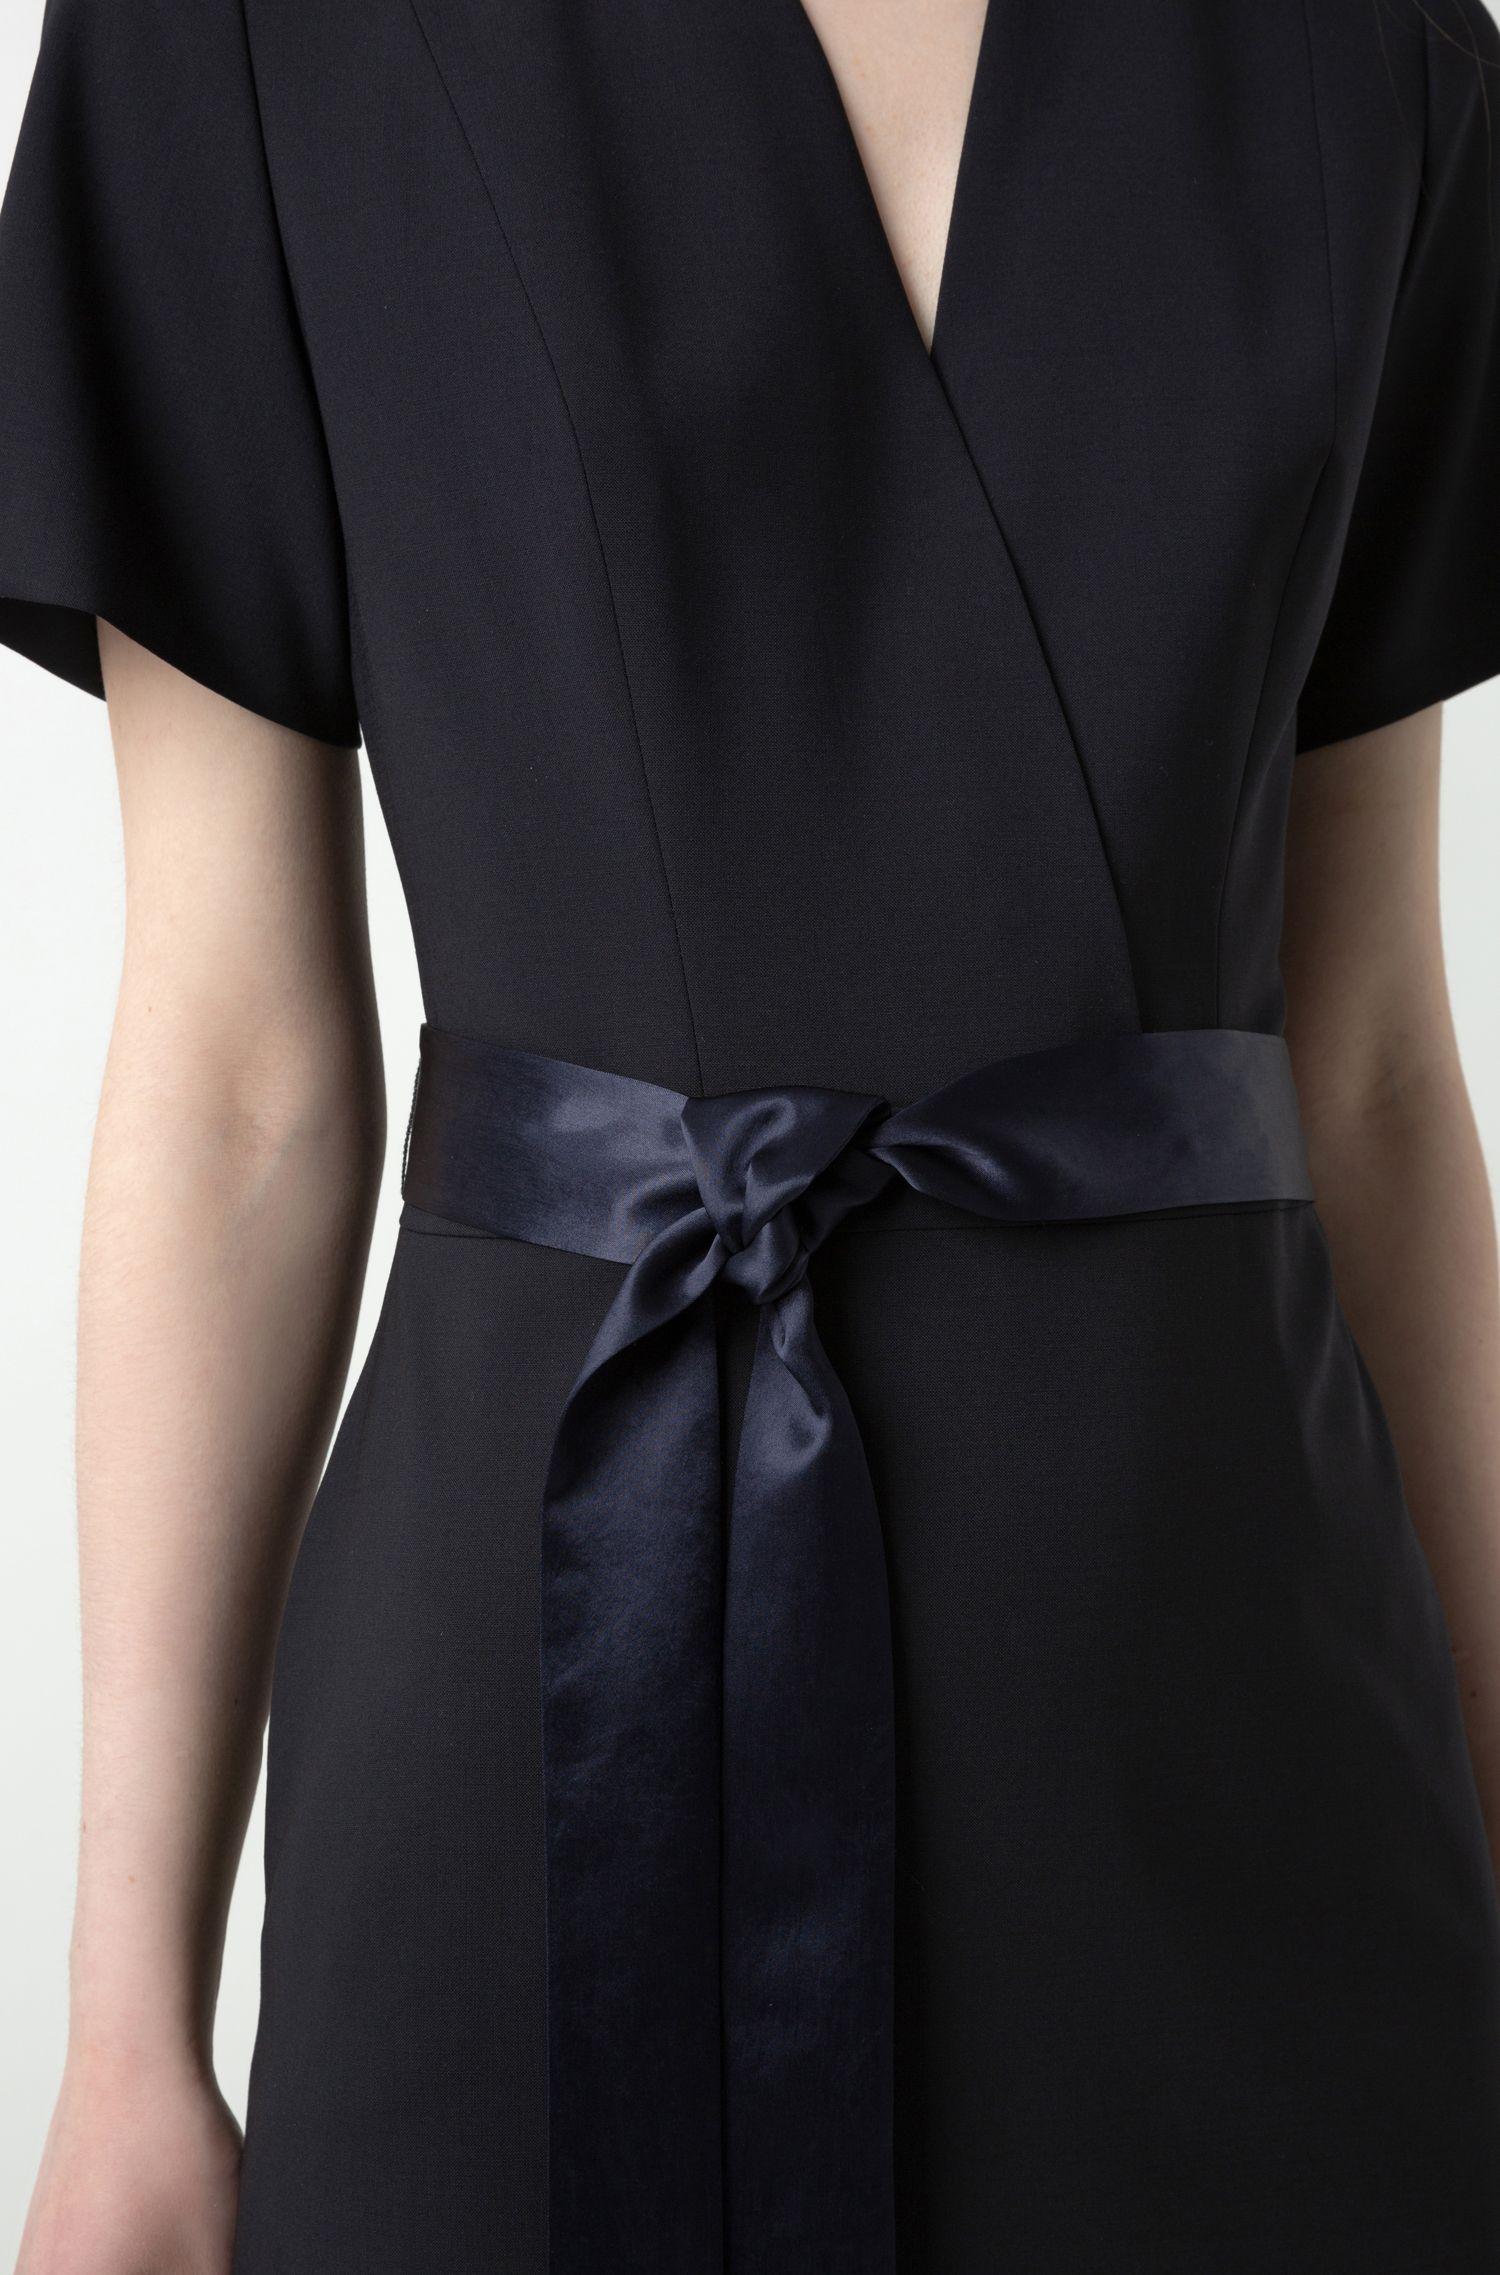 V-neck dress in crease-resistant stretch virgin wool, Dark Blue